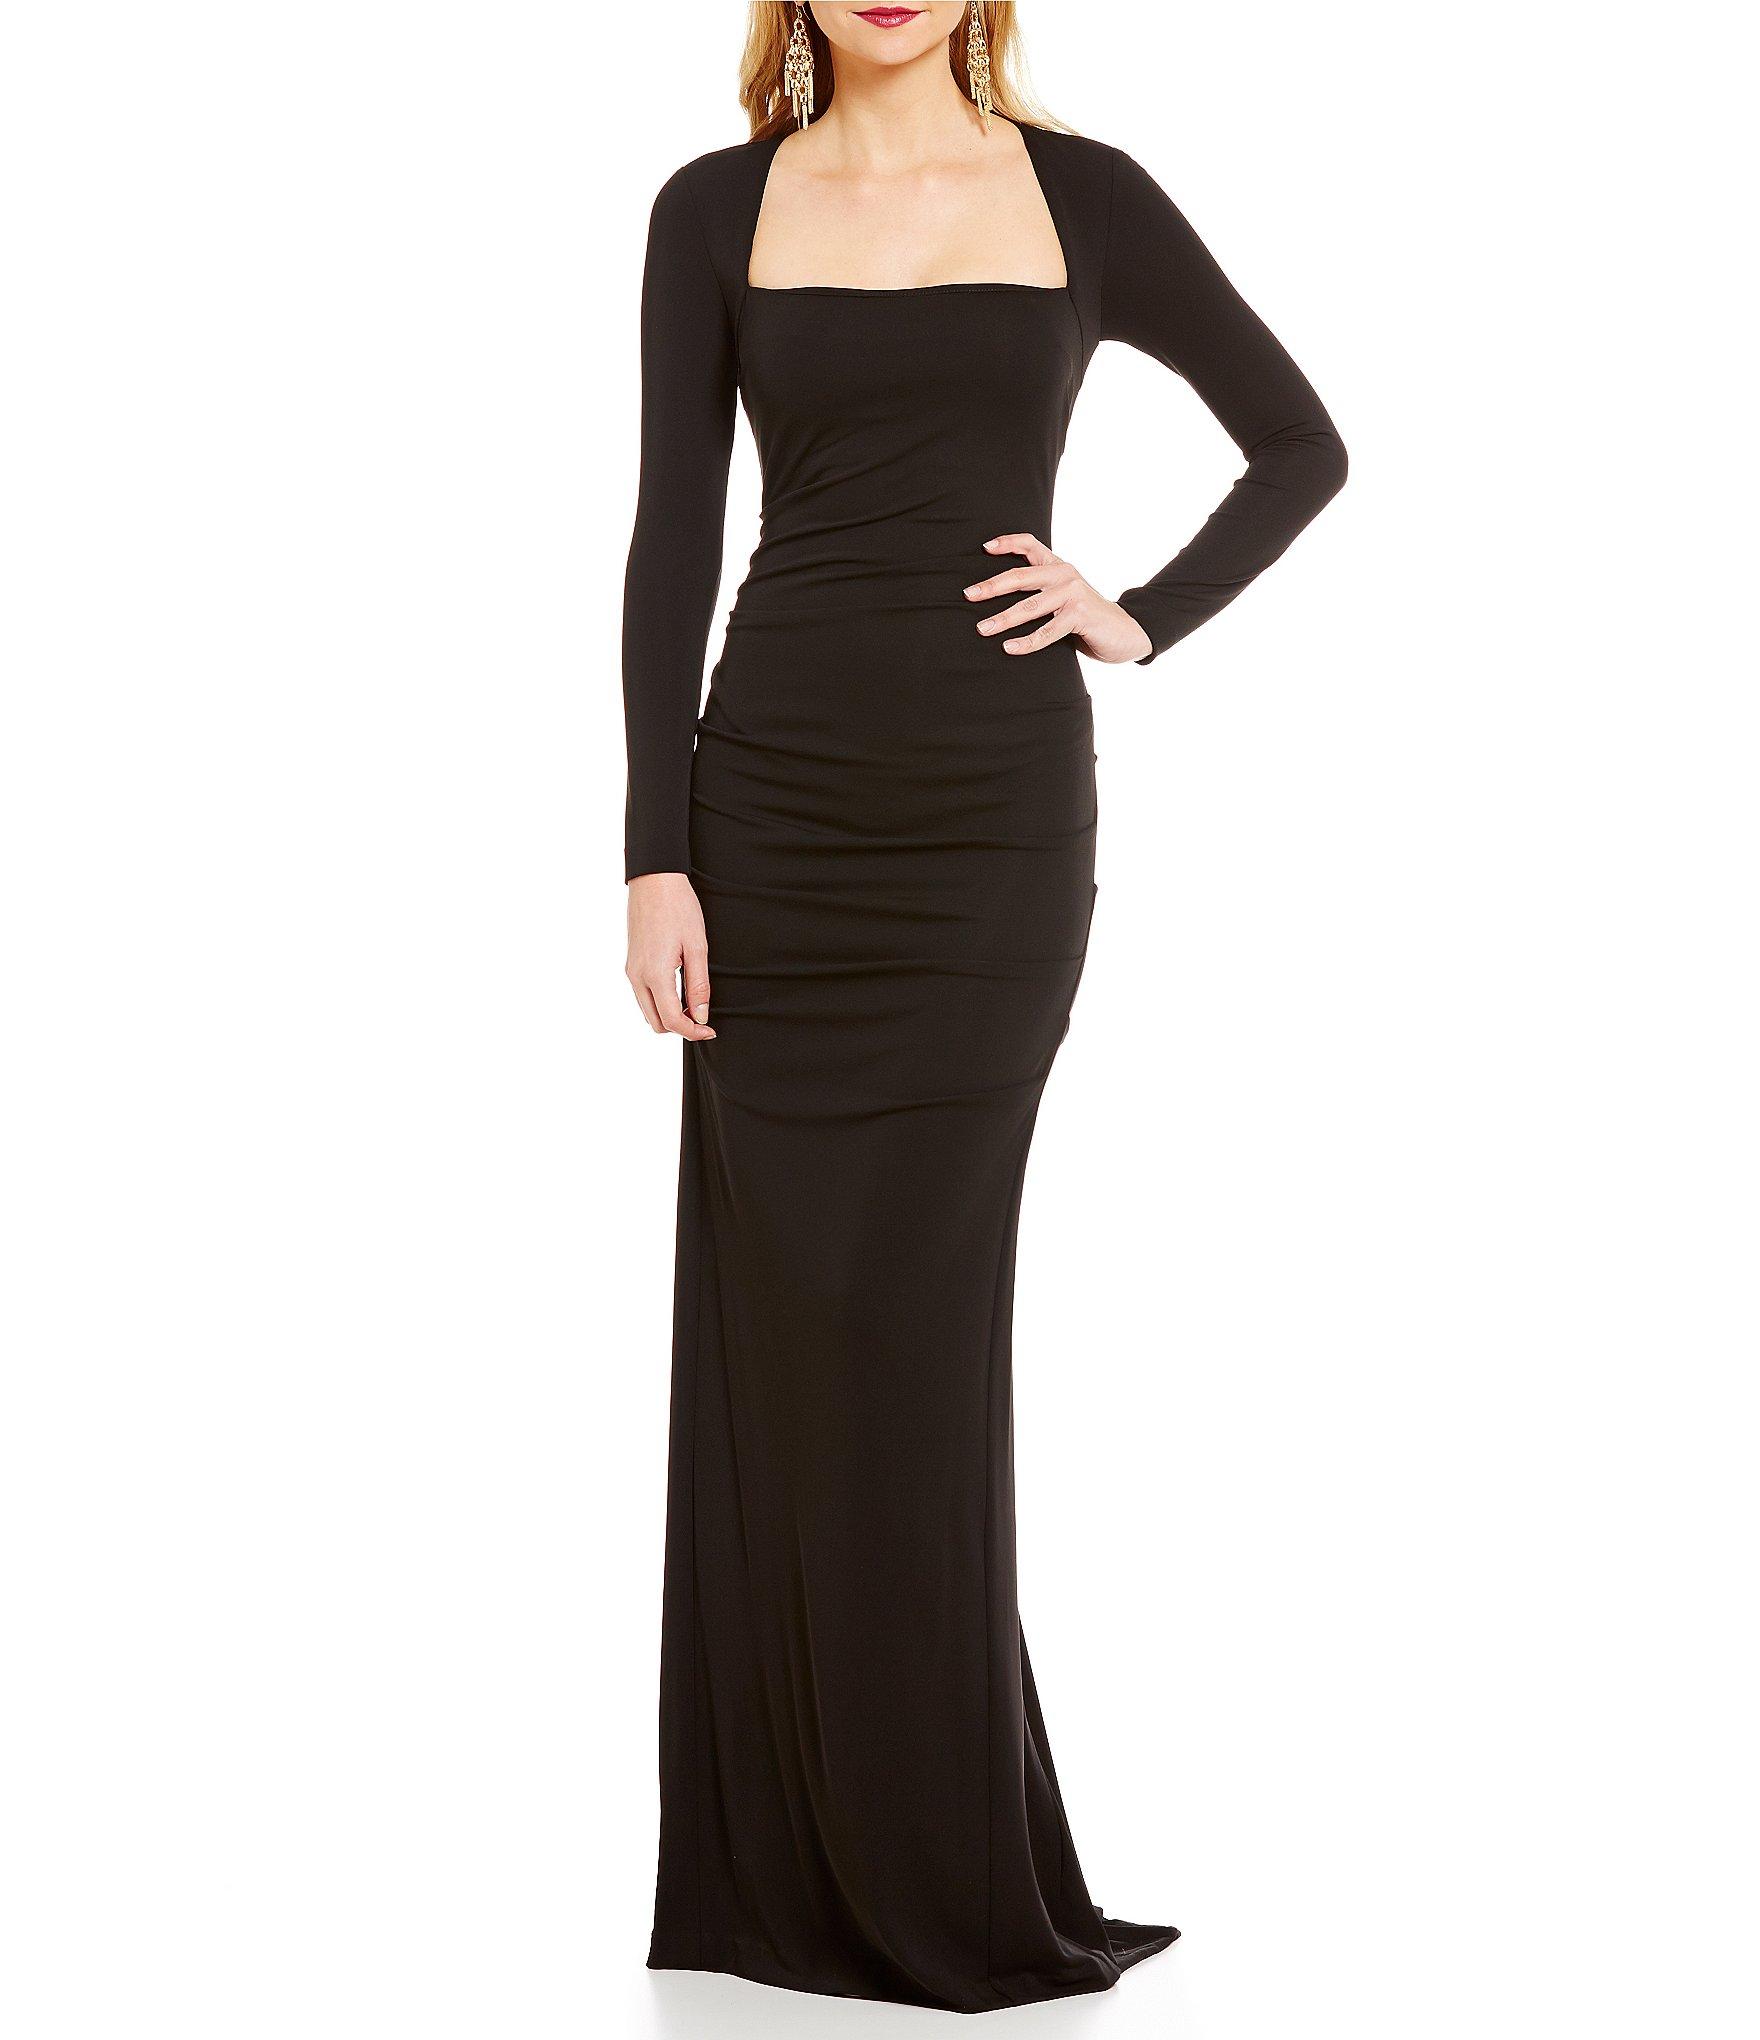 Black dress long formal - Women S Clothing Dresses Formal Dresses Gowns Long Sleeve Dillards Com